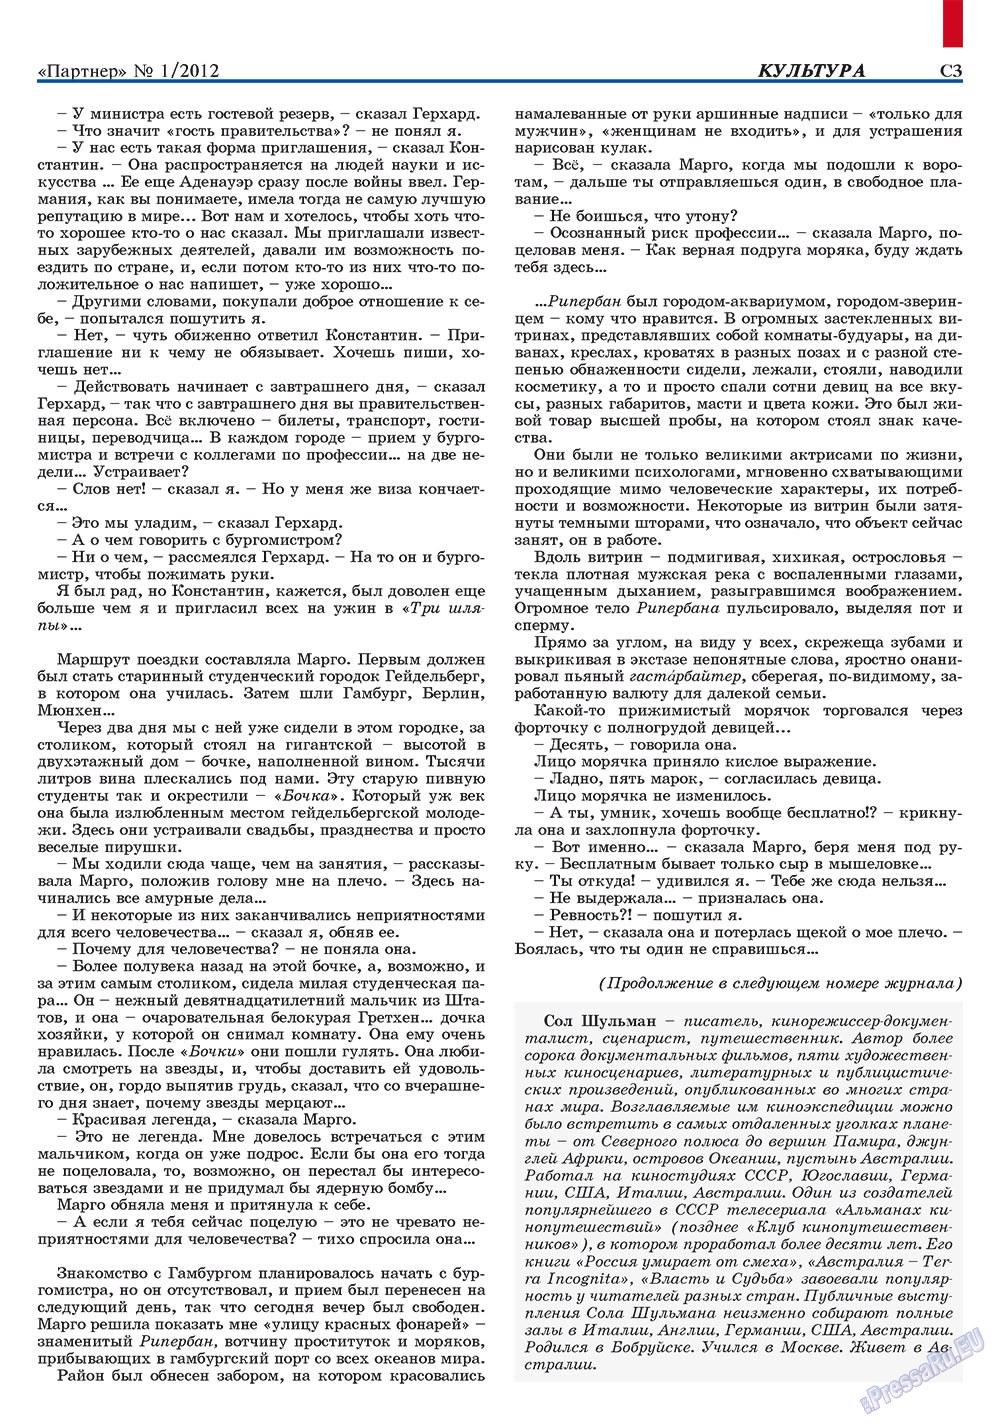 Партнер-север (журнал). 2012 год, номер 1, стр. 61